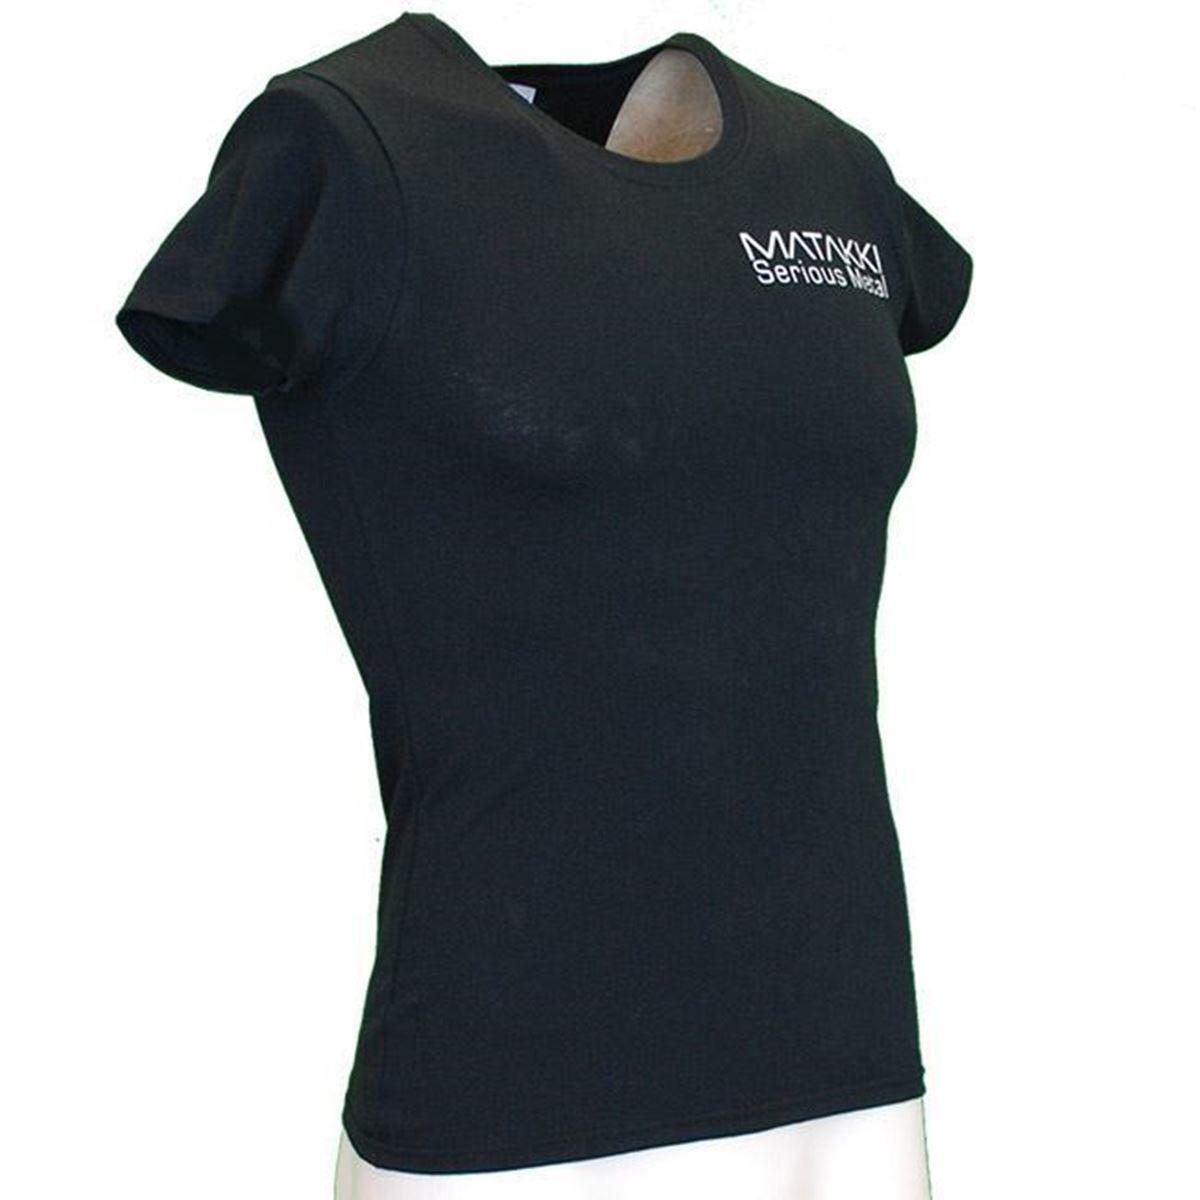 Picture of Ladies Matakki Black T Shirt